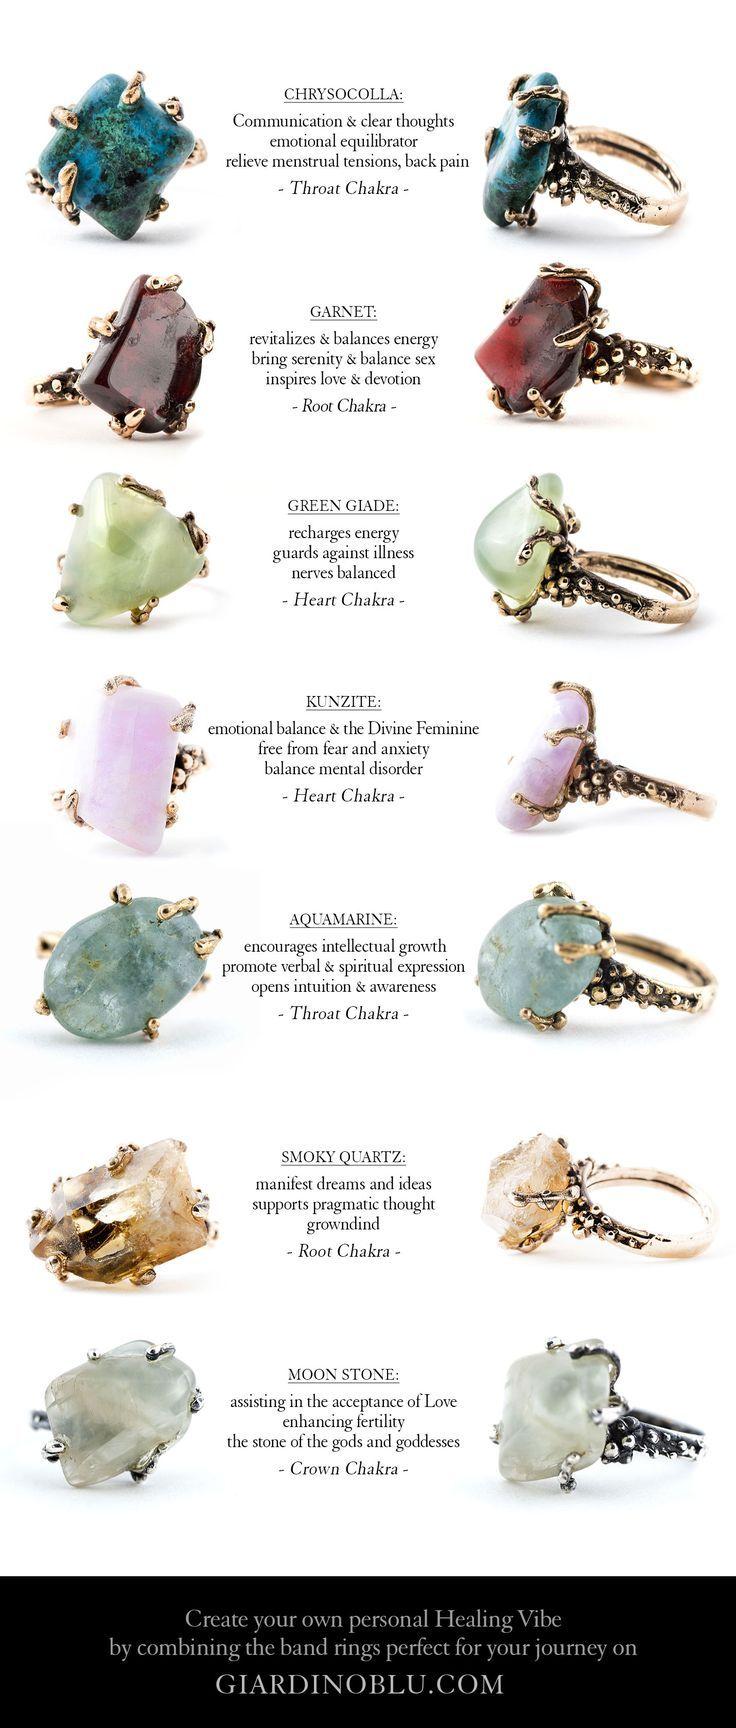 Crystal Band Ring Buying Guide Crysocolla Garnet Green